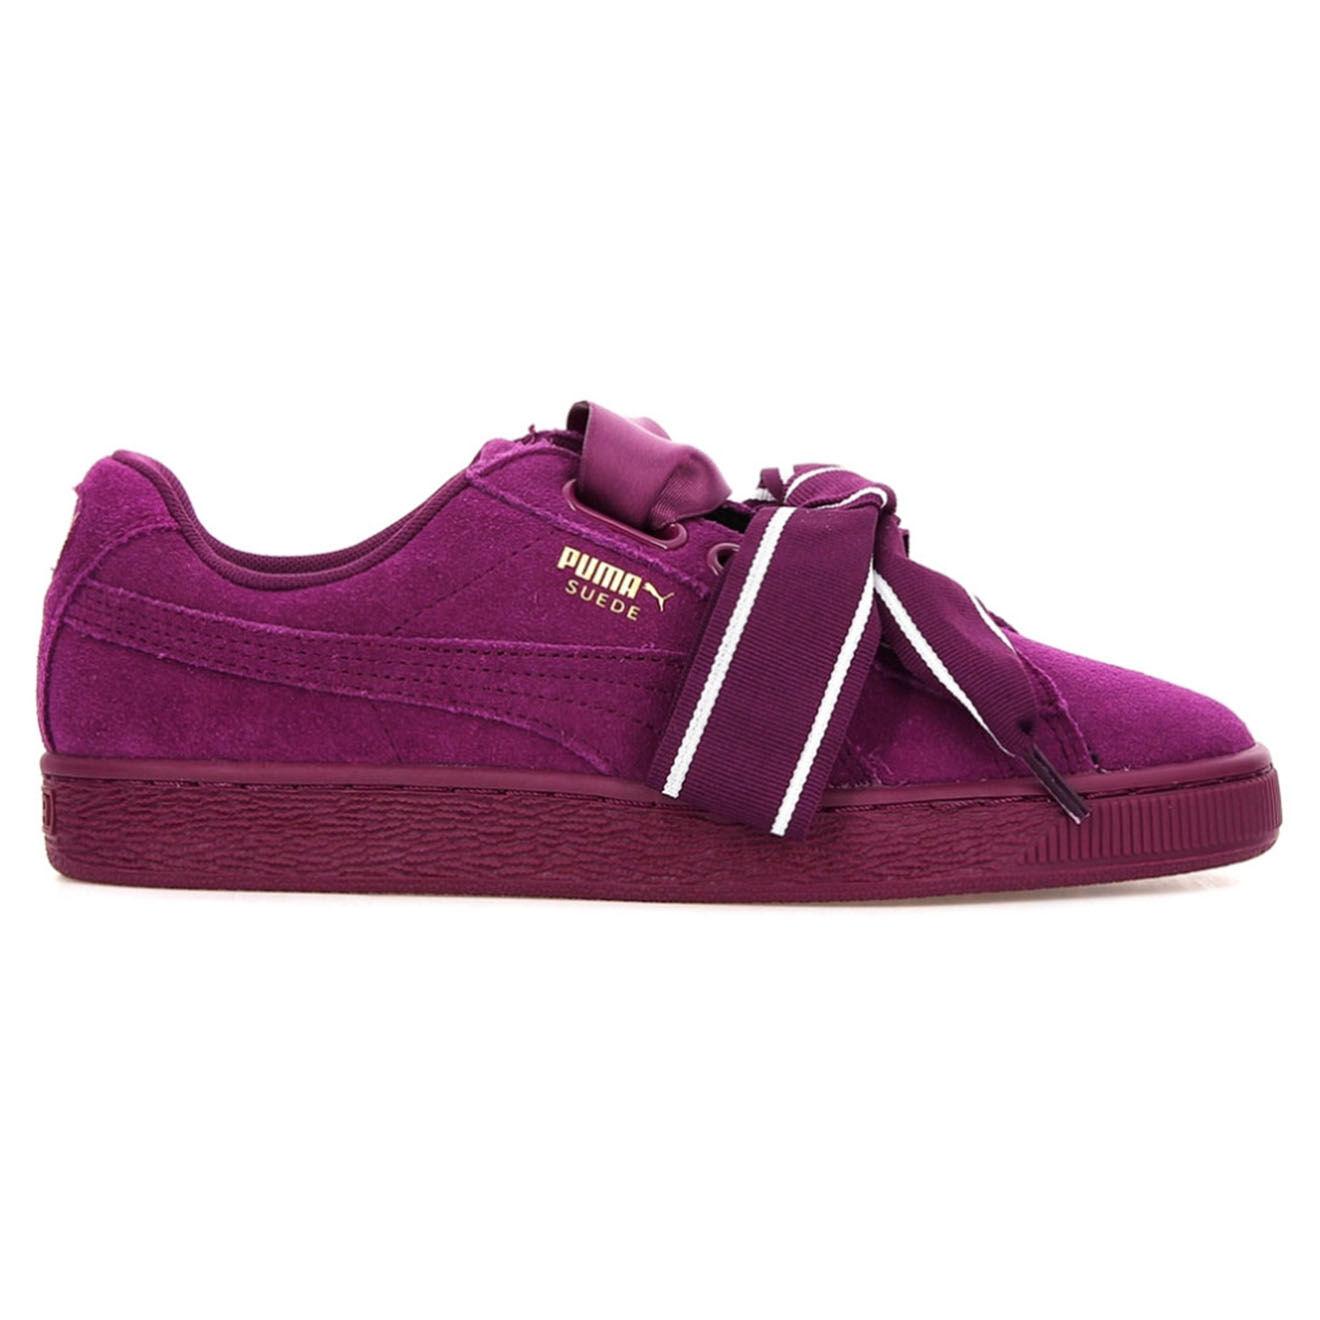 Puma Baskets en Velours de Cuir Heart Satin II Wn's violettes